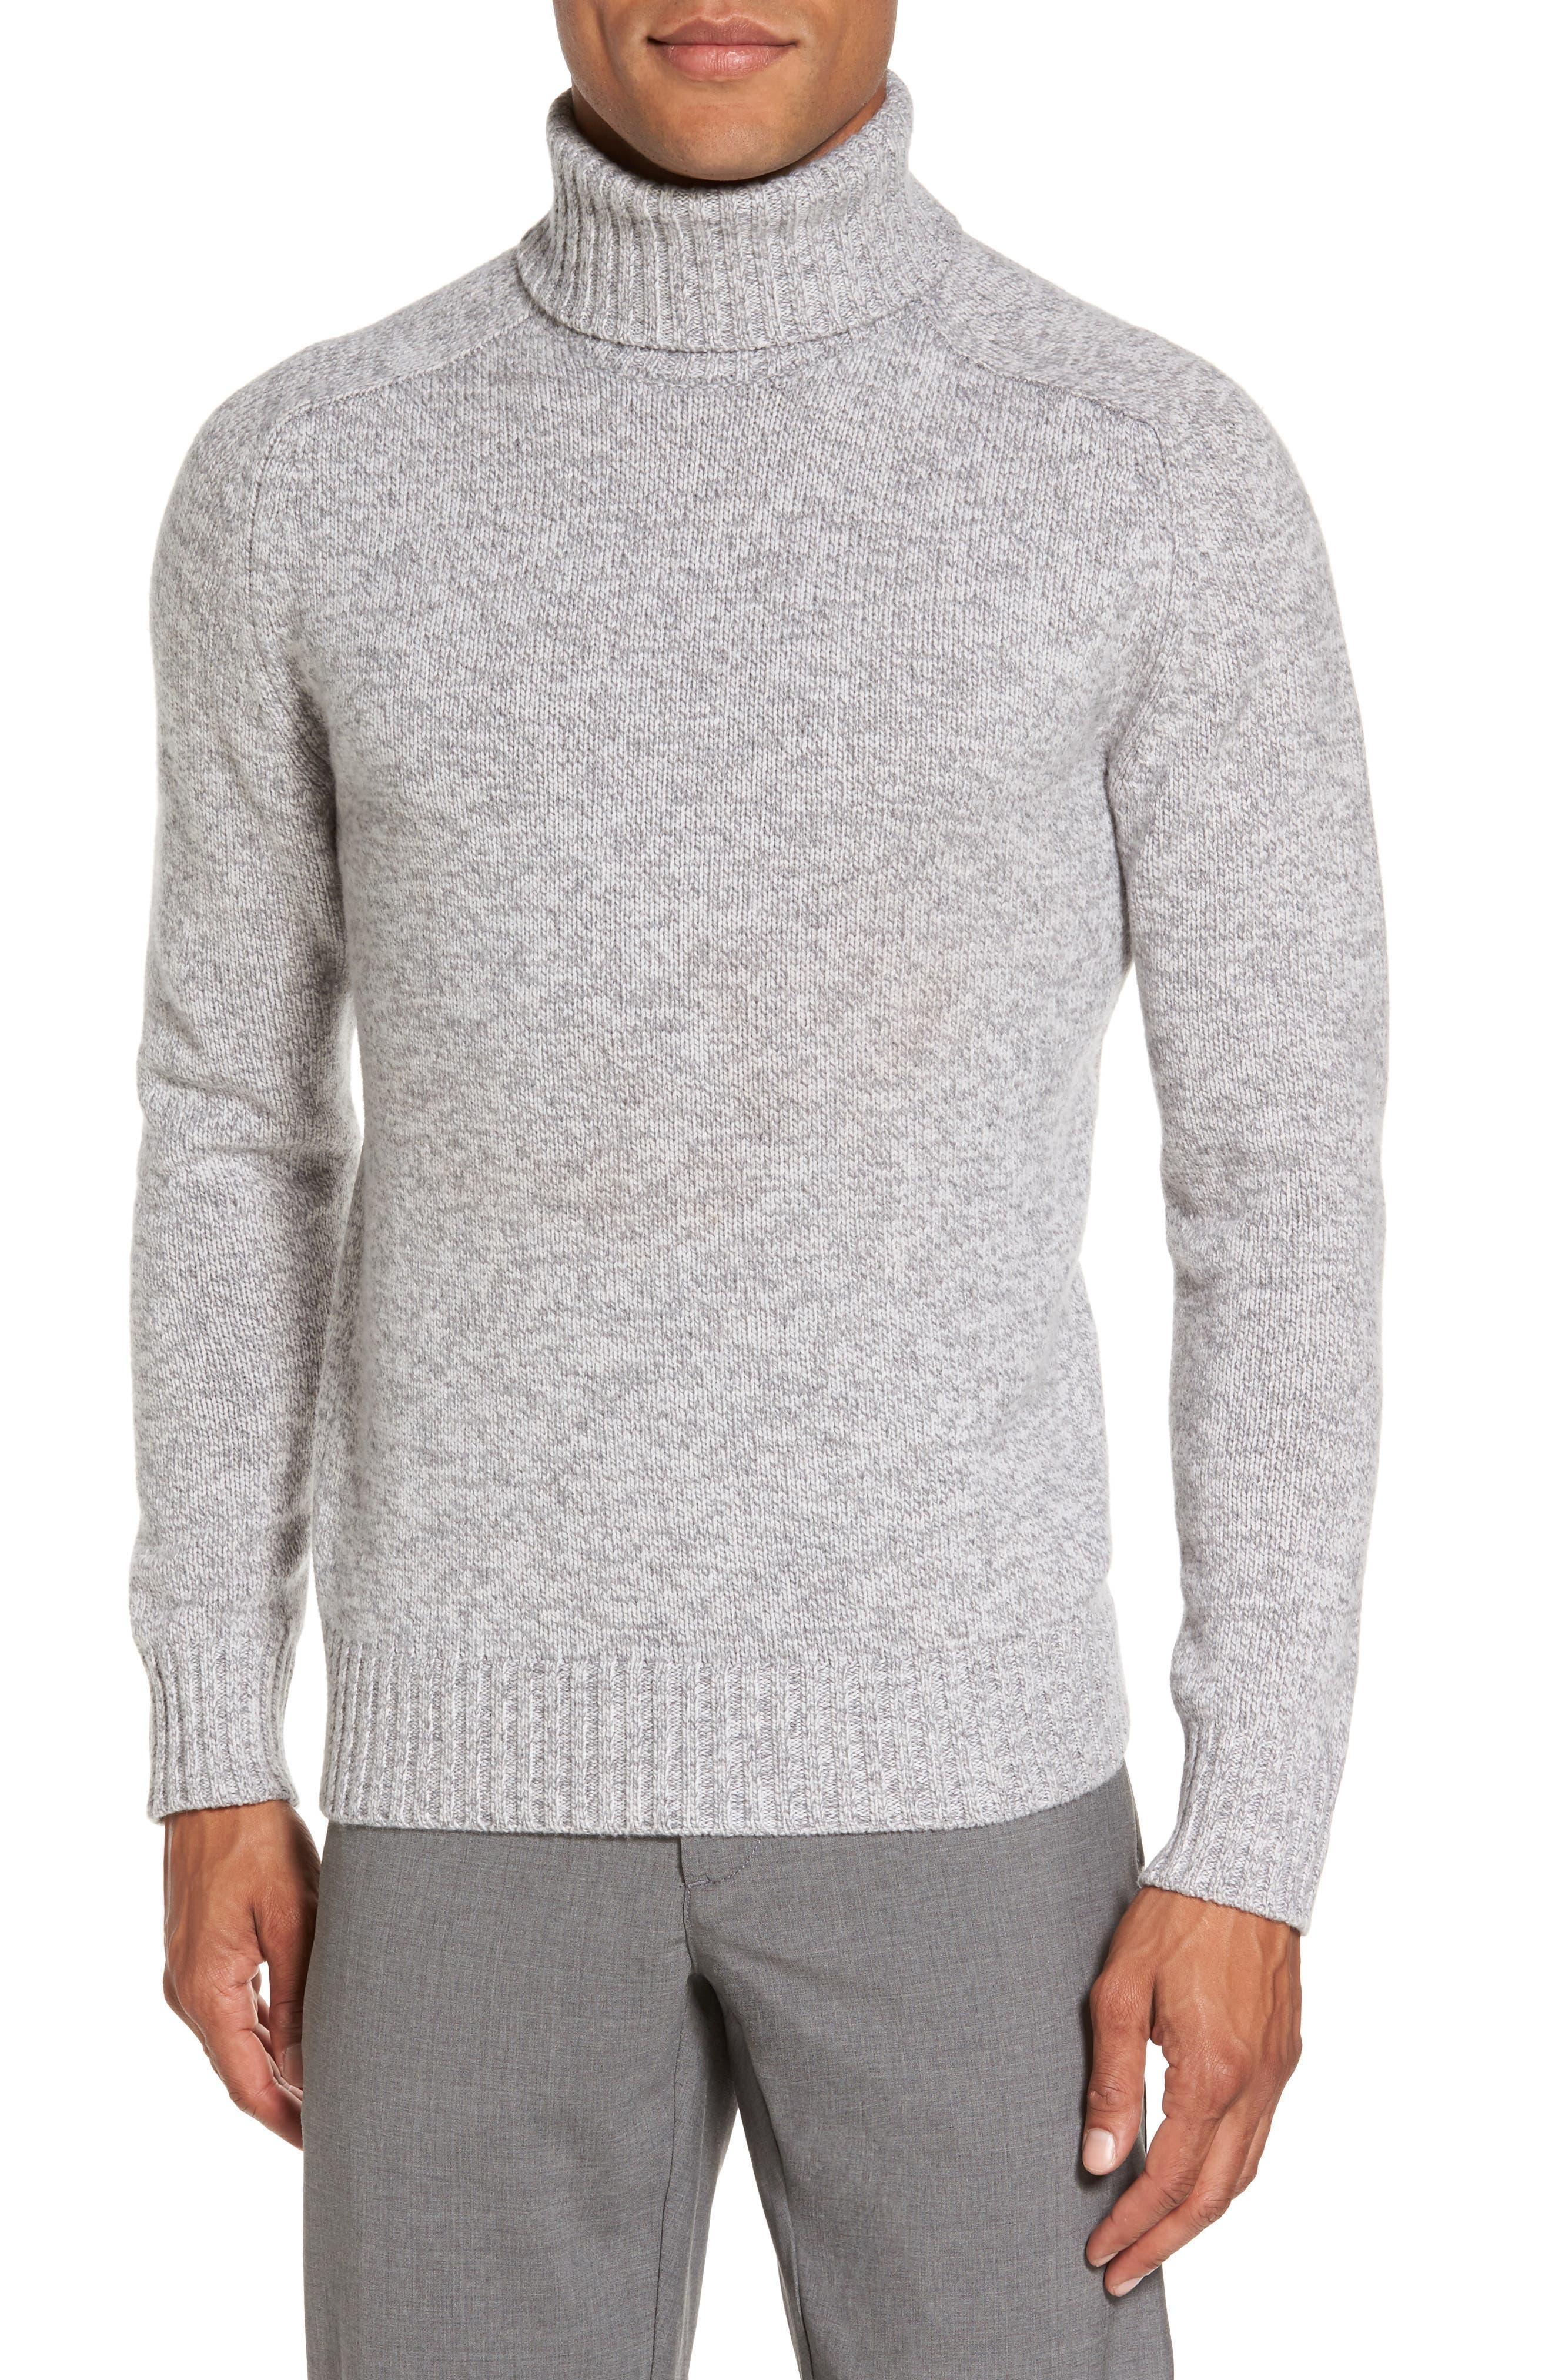 Marled Turtleneck Sweater,                         Main,                         color, Light Grey/ Dark Grey